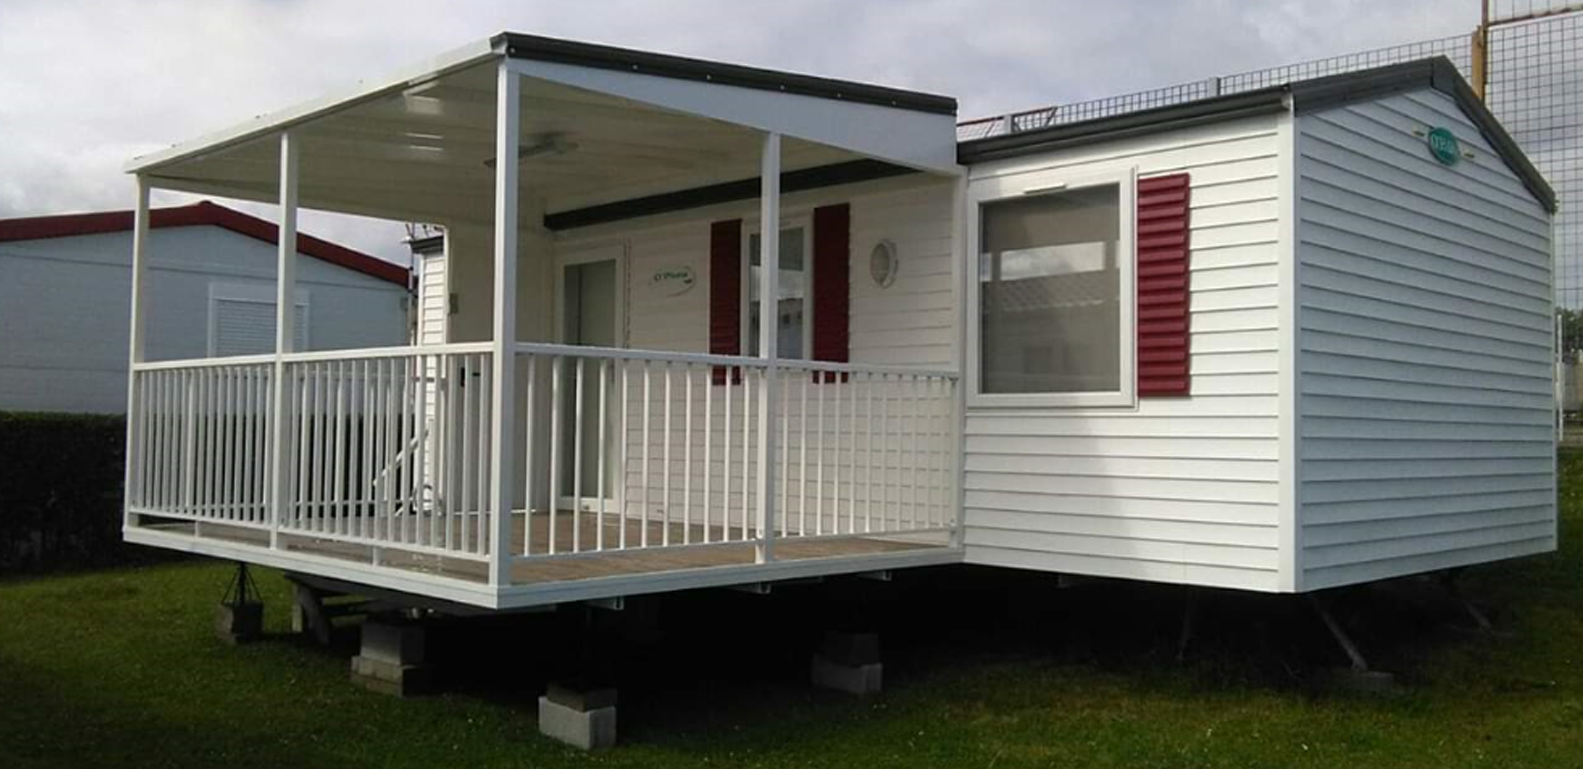 Barbacoas para mobil home y campings